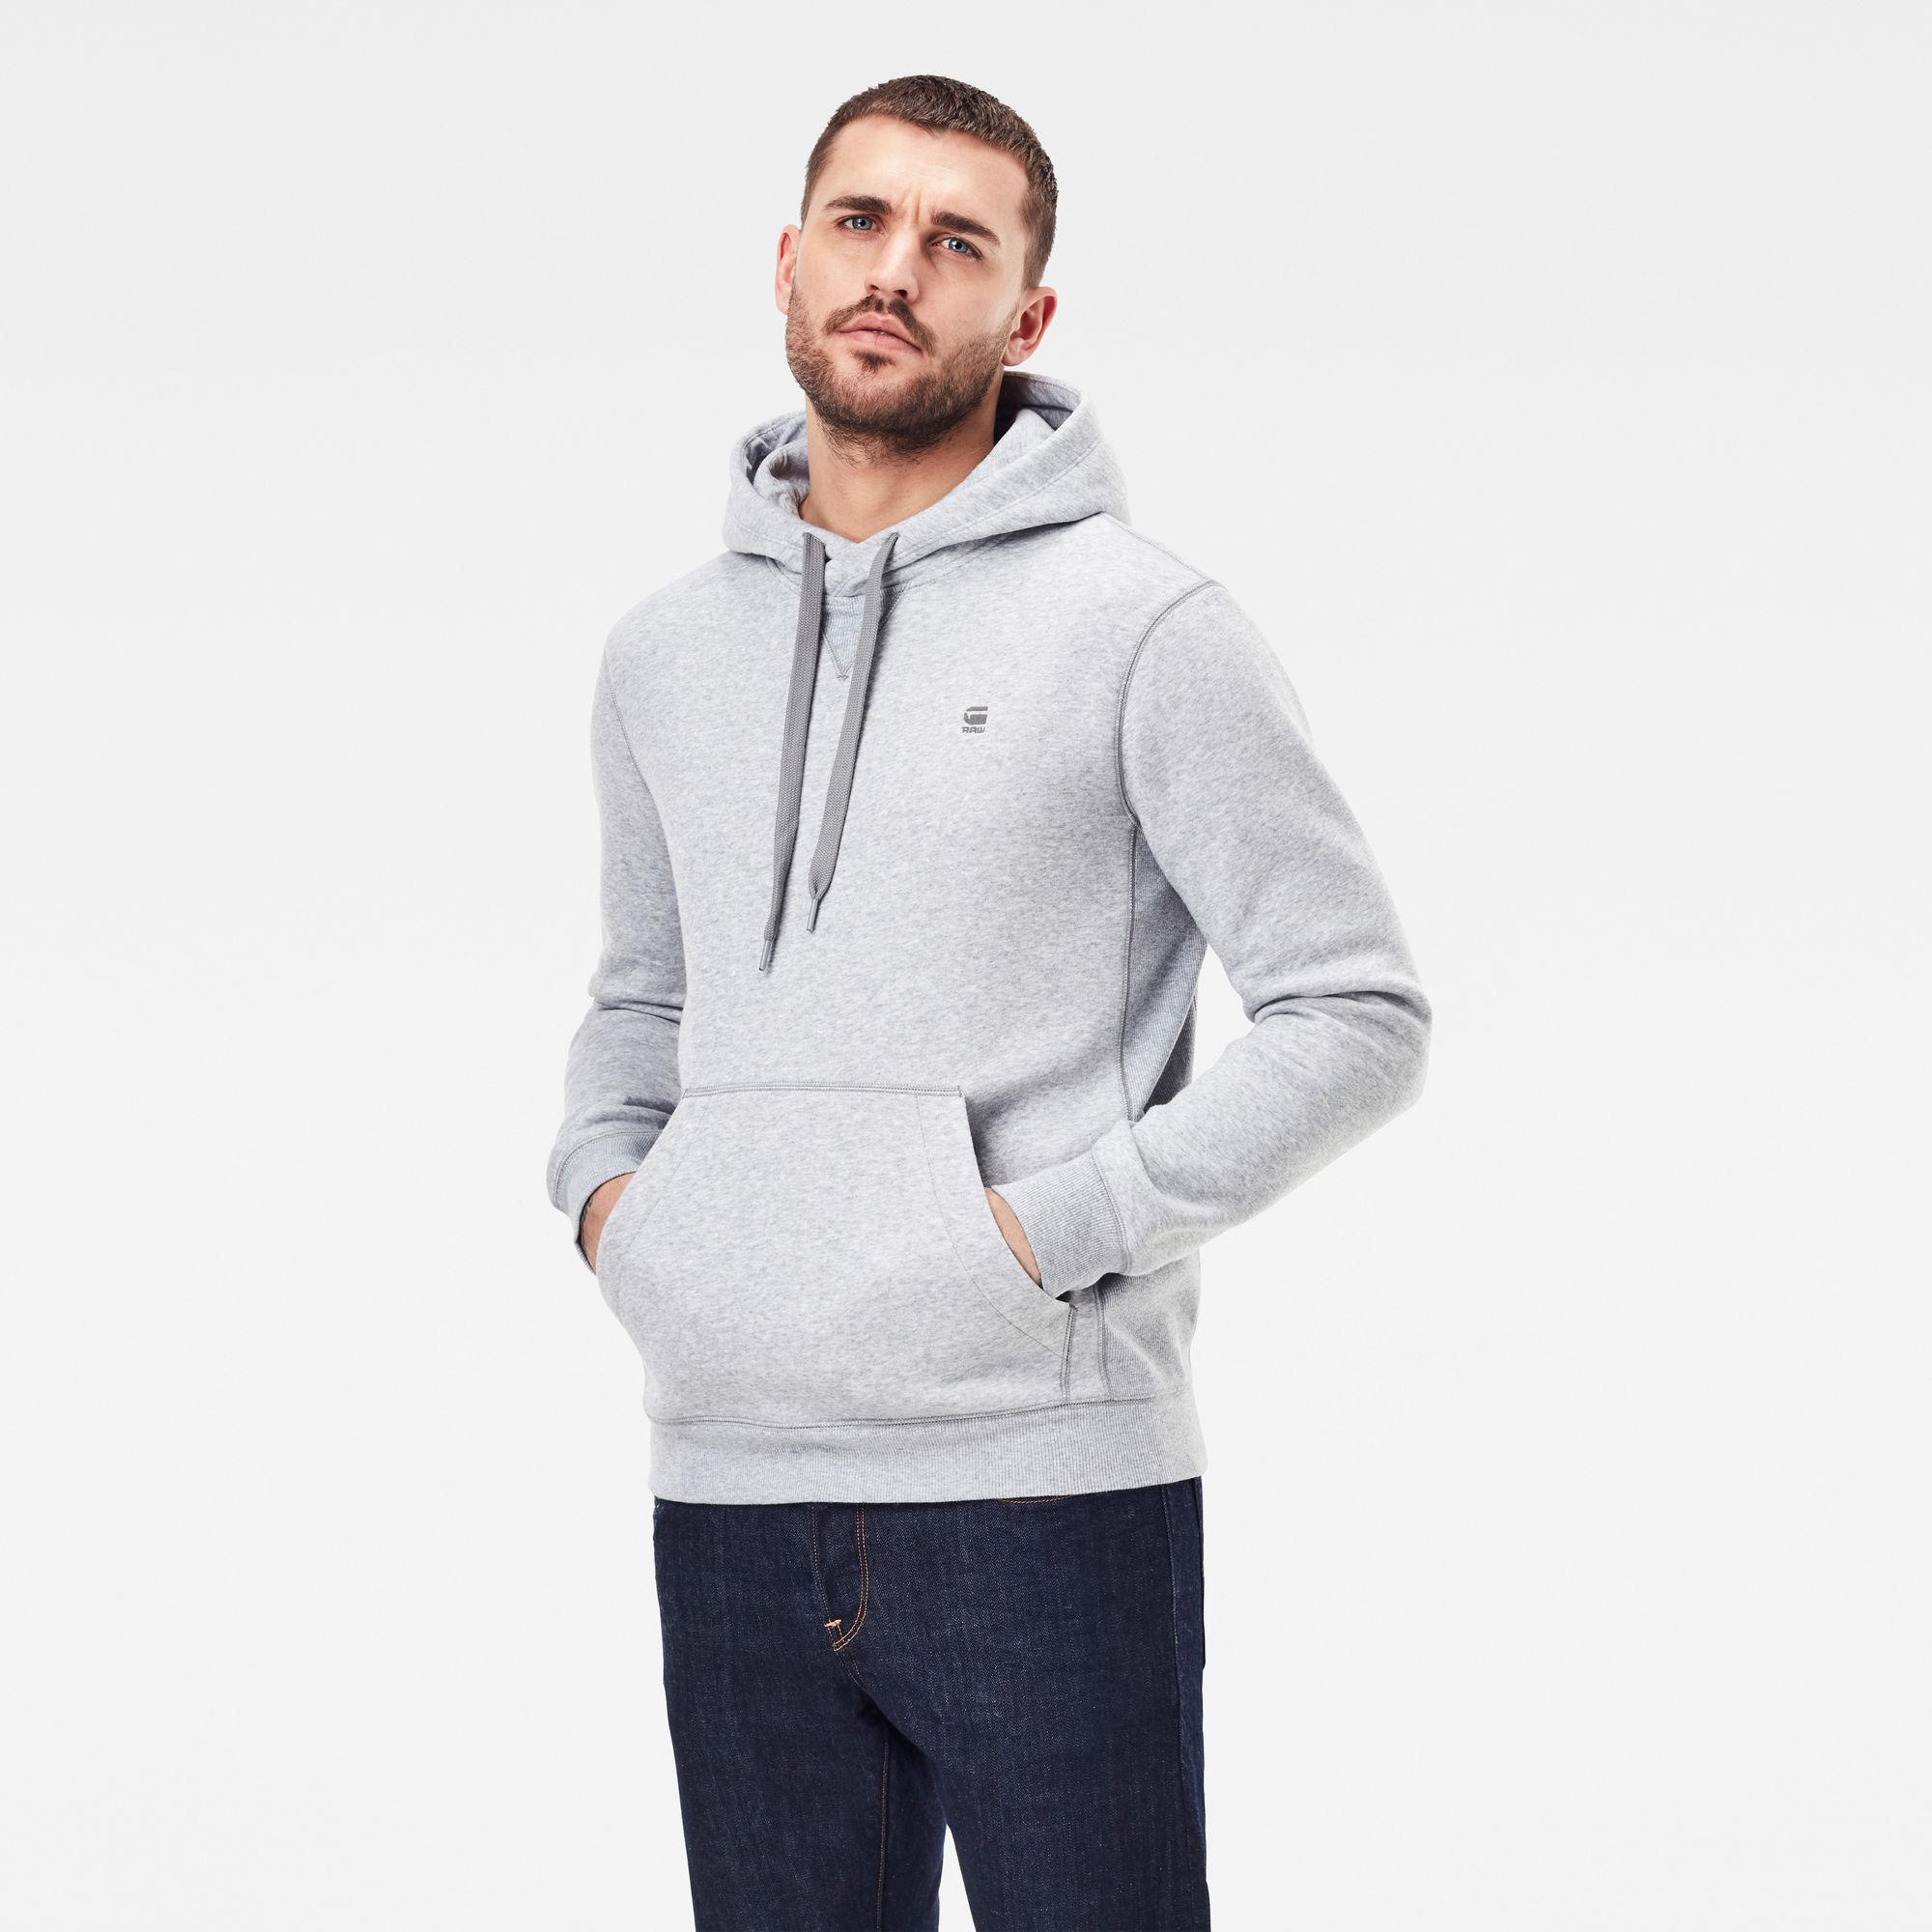 G-Star RAW Heren Premium Core Sweater Grijs